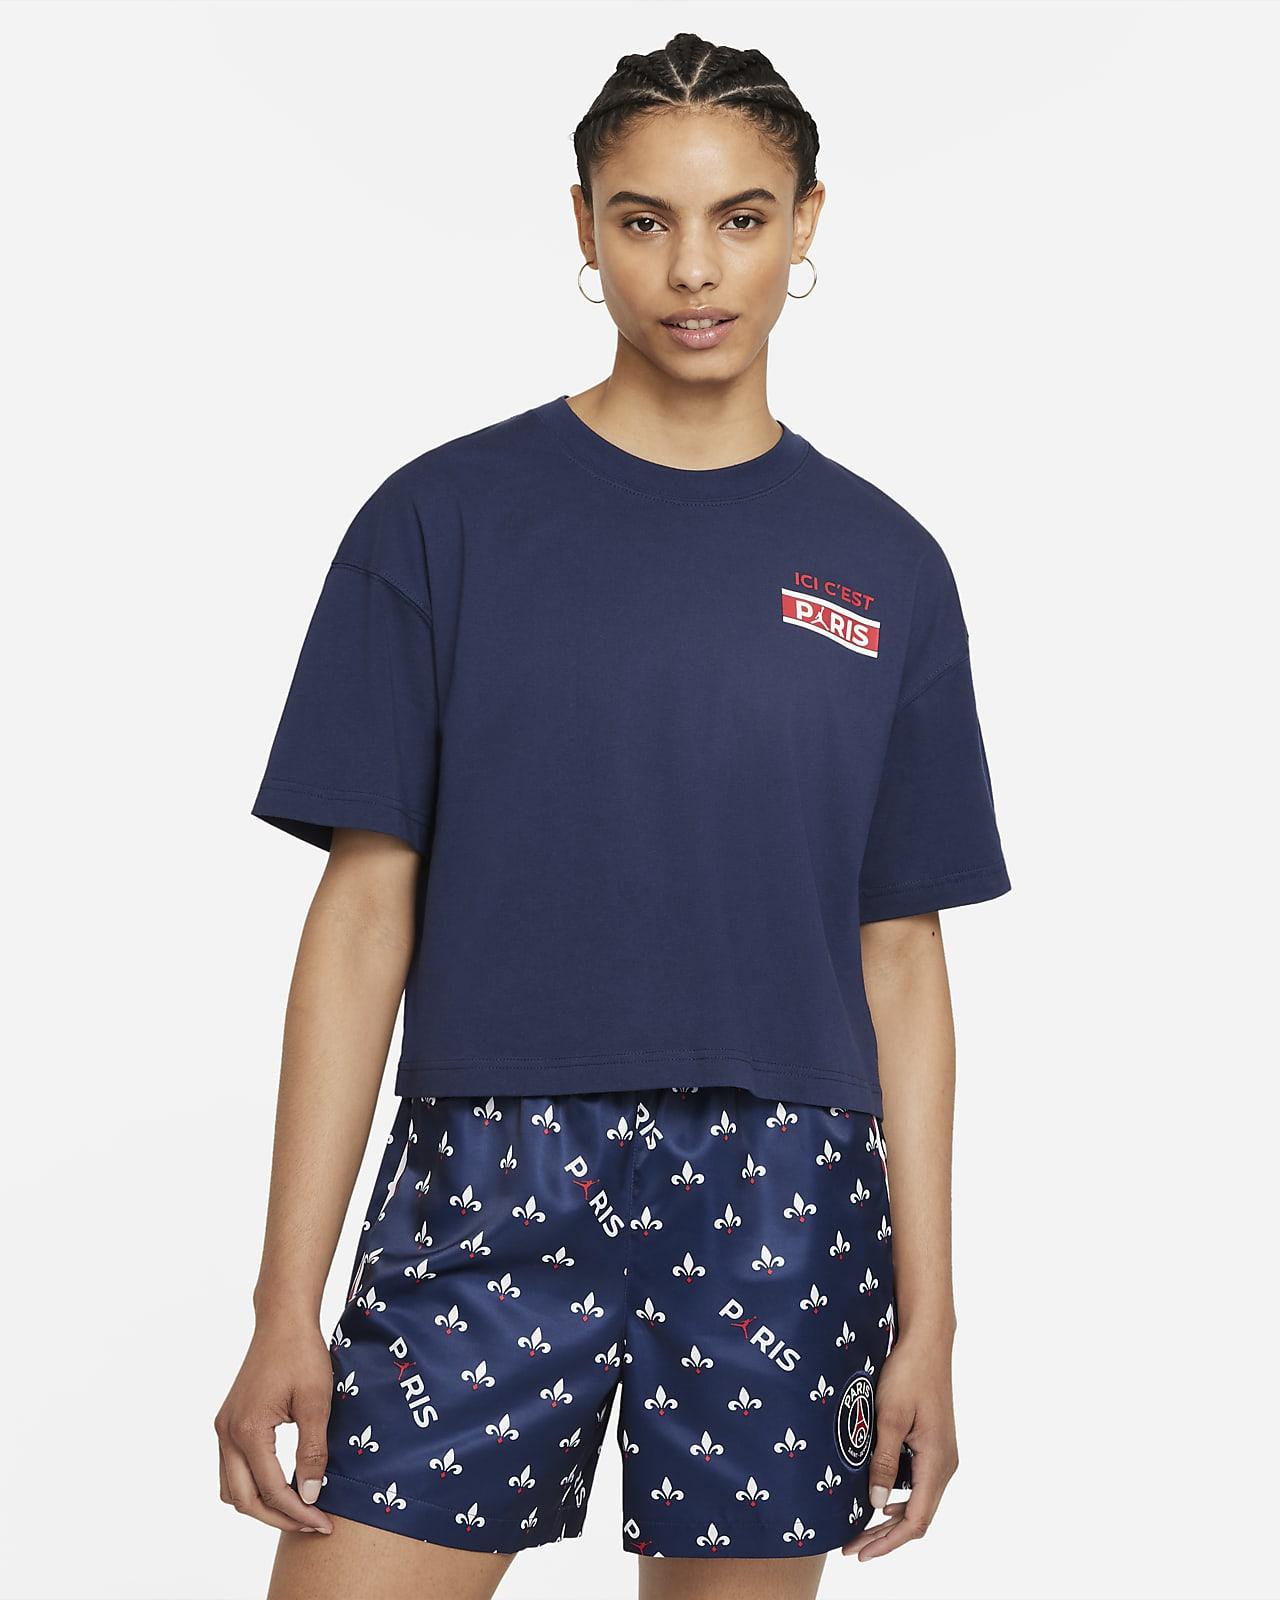 Paris Saint-Germain Women's Short-Sleeve T-Shirt